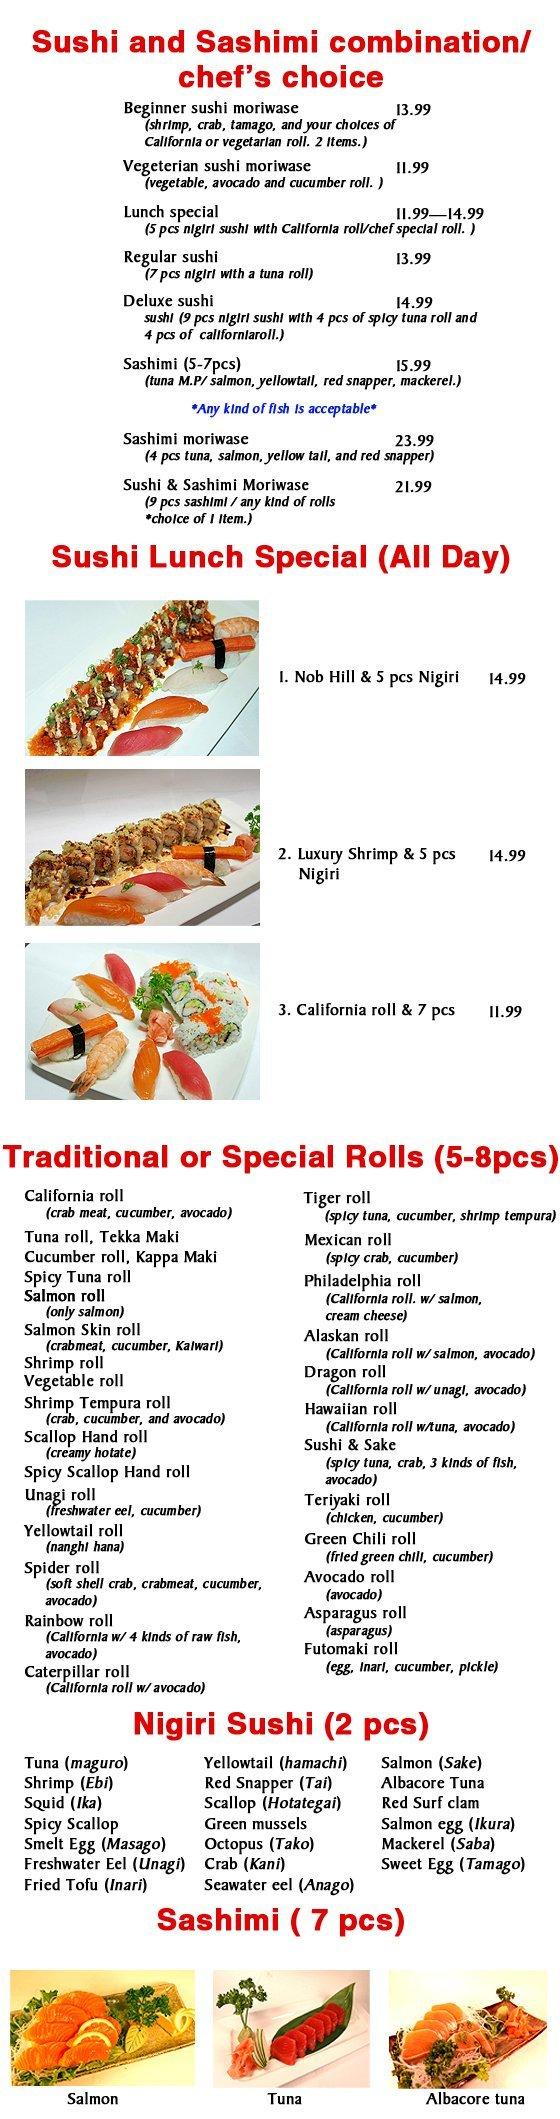 Sushi and Sake - Albuquerque, NM - Korean BBQ House and Sushi & Sake